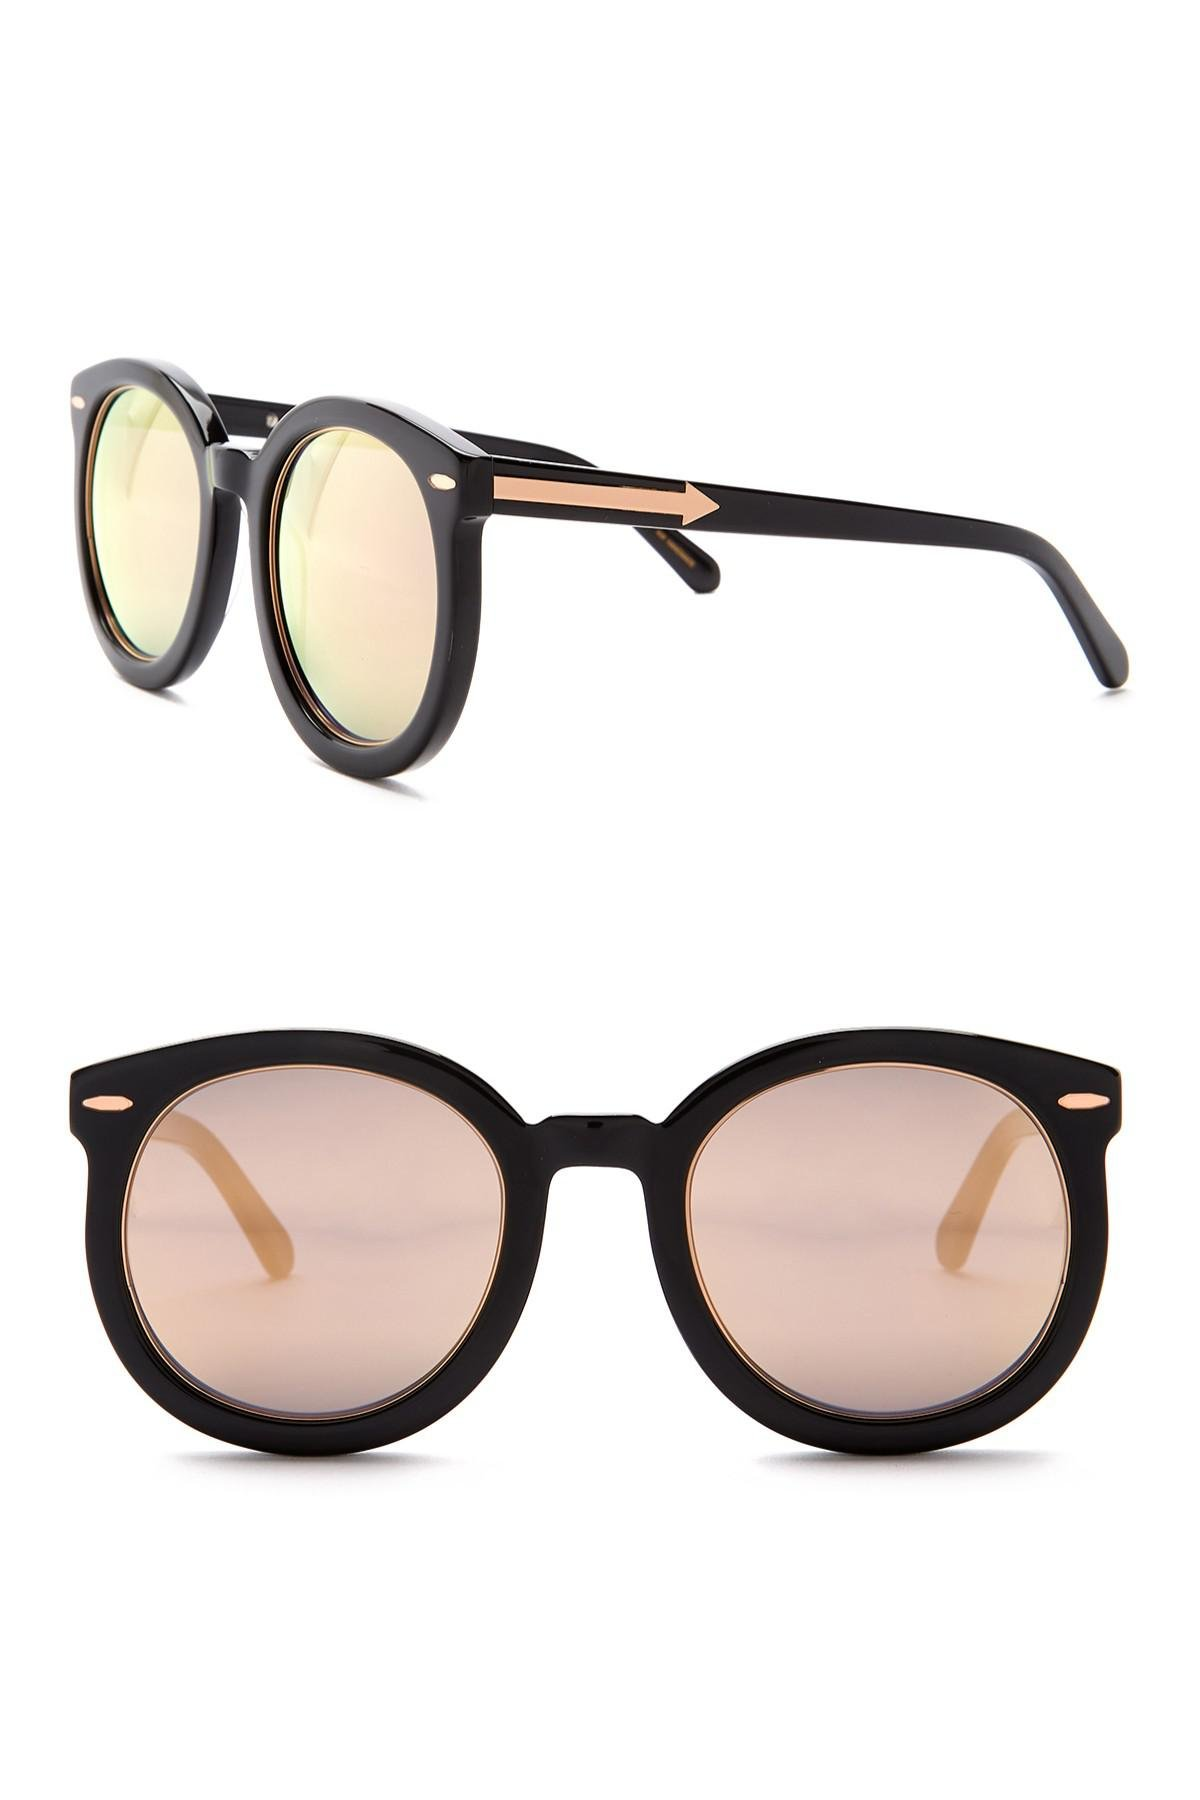 91778640302 Lyst - Karen Walker Super Duper Superstars 50mm Round Sunglasses in ...